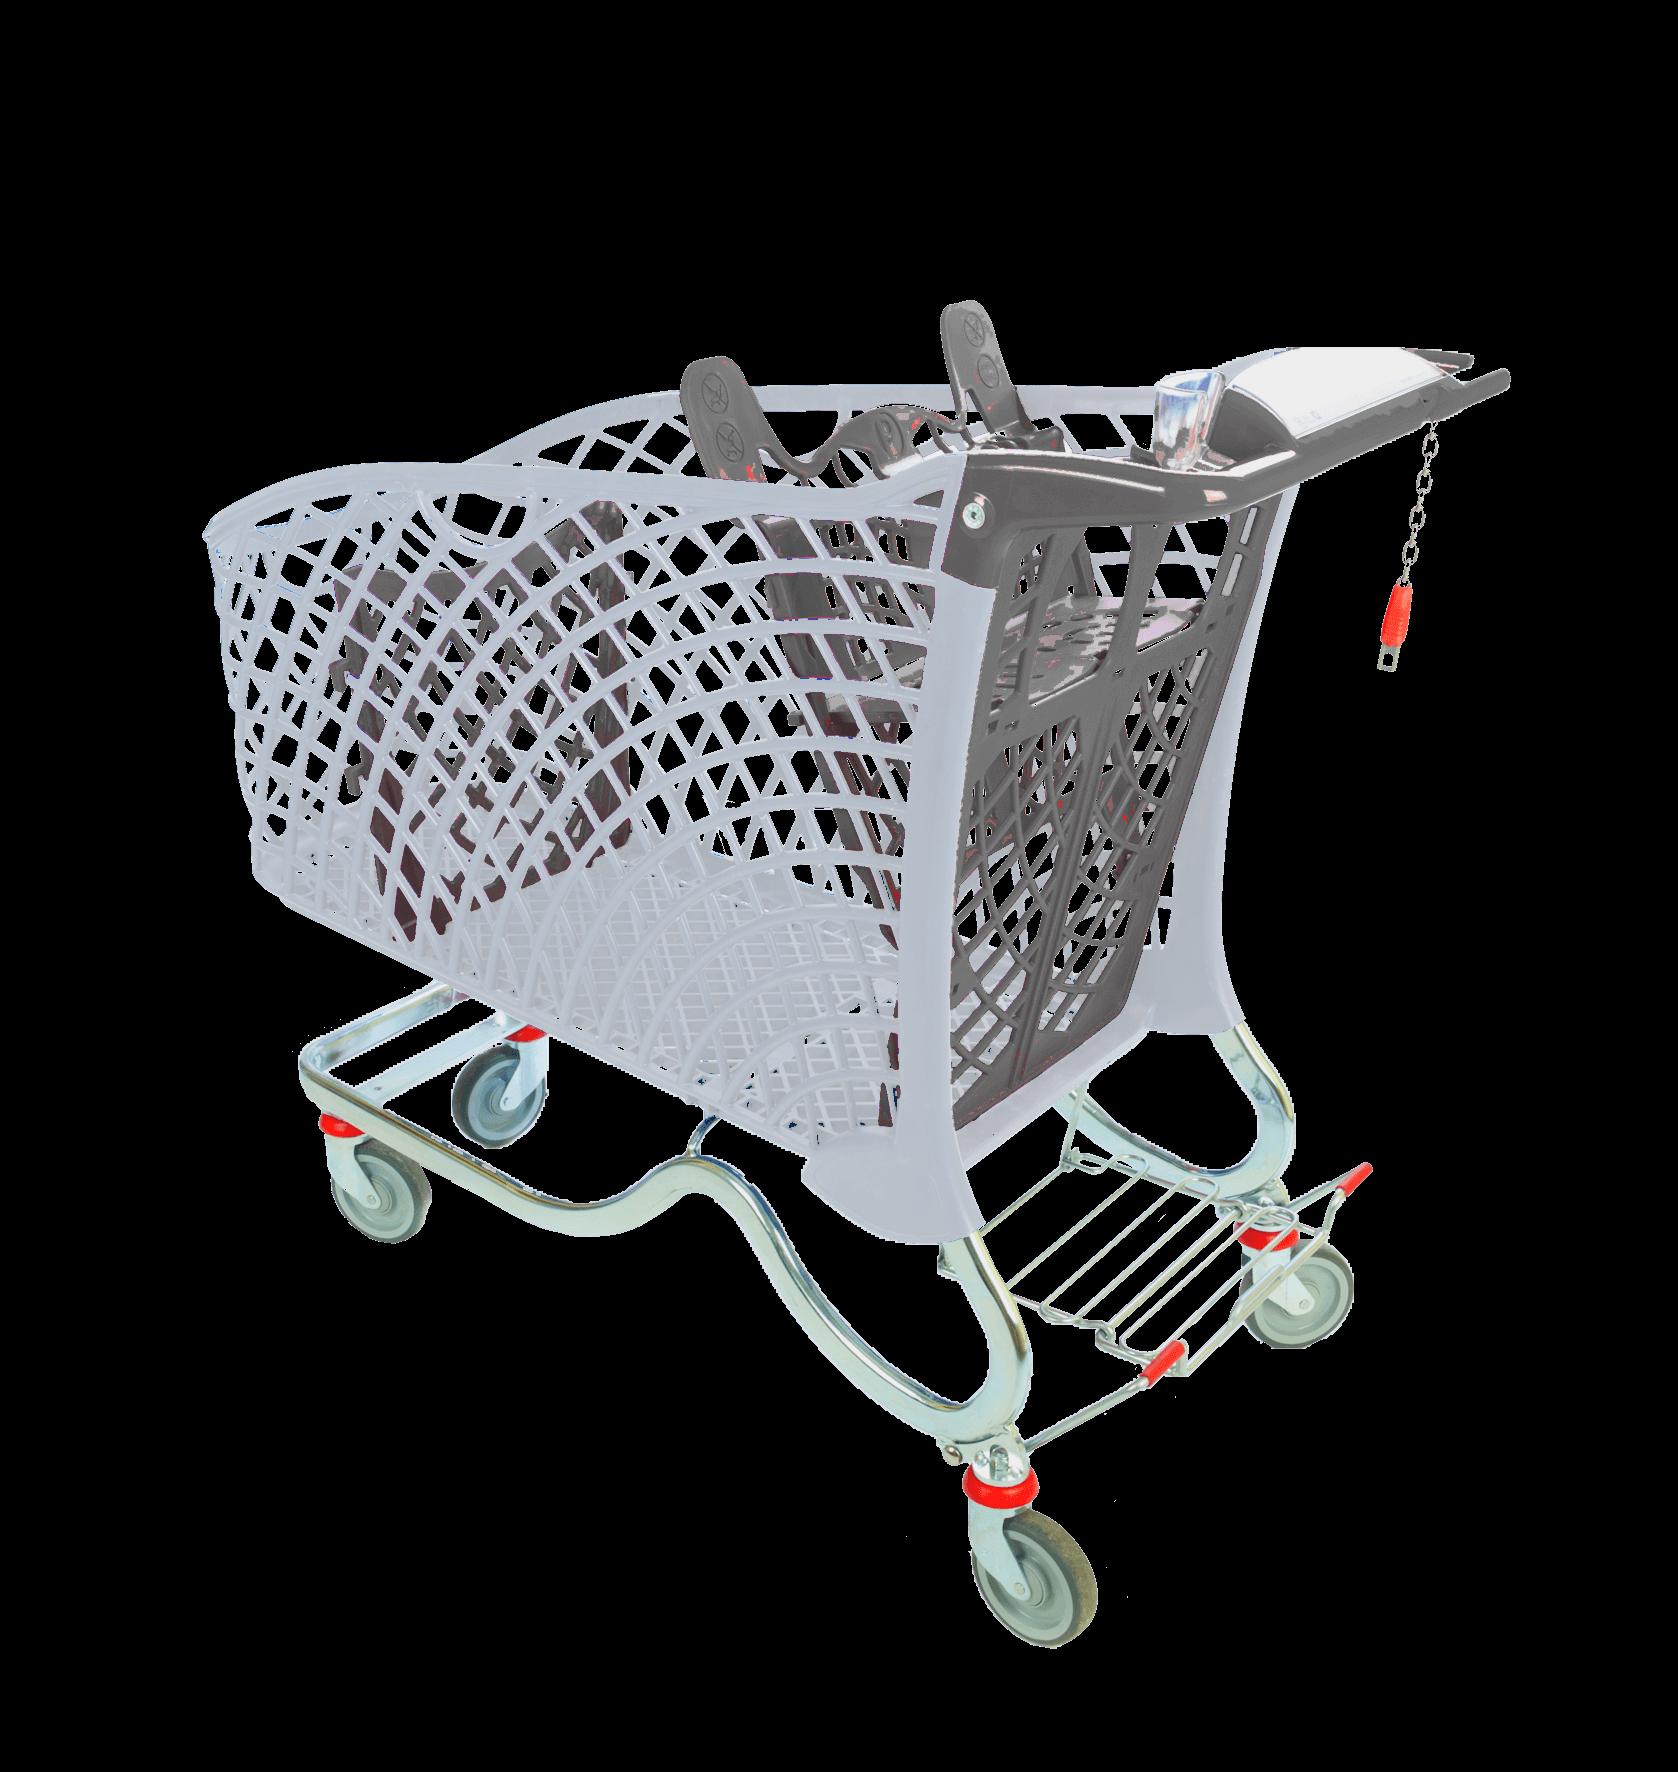 Hybrid 240lt Eco Shopping Trolley from Mann Engineering